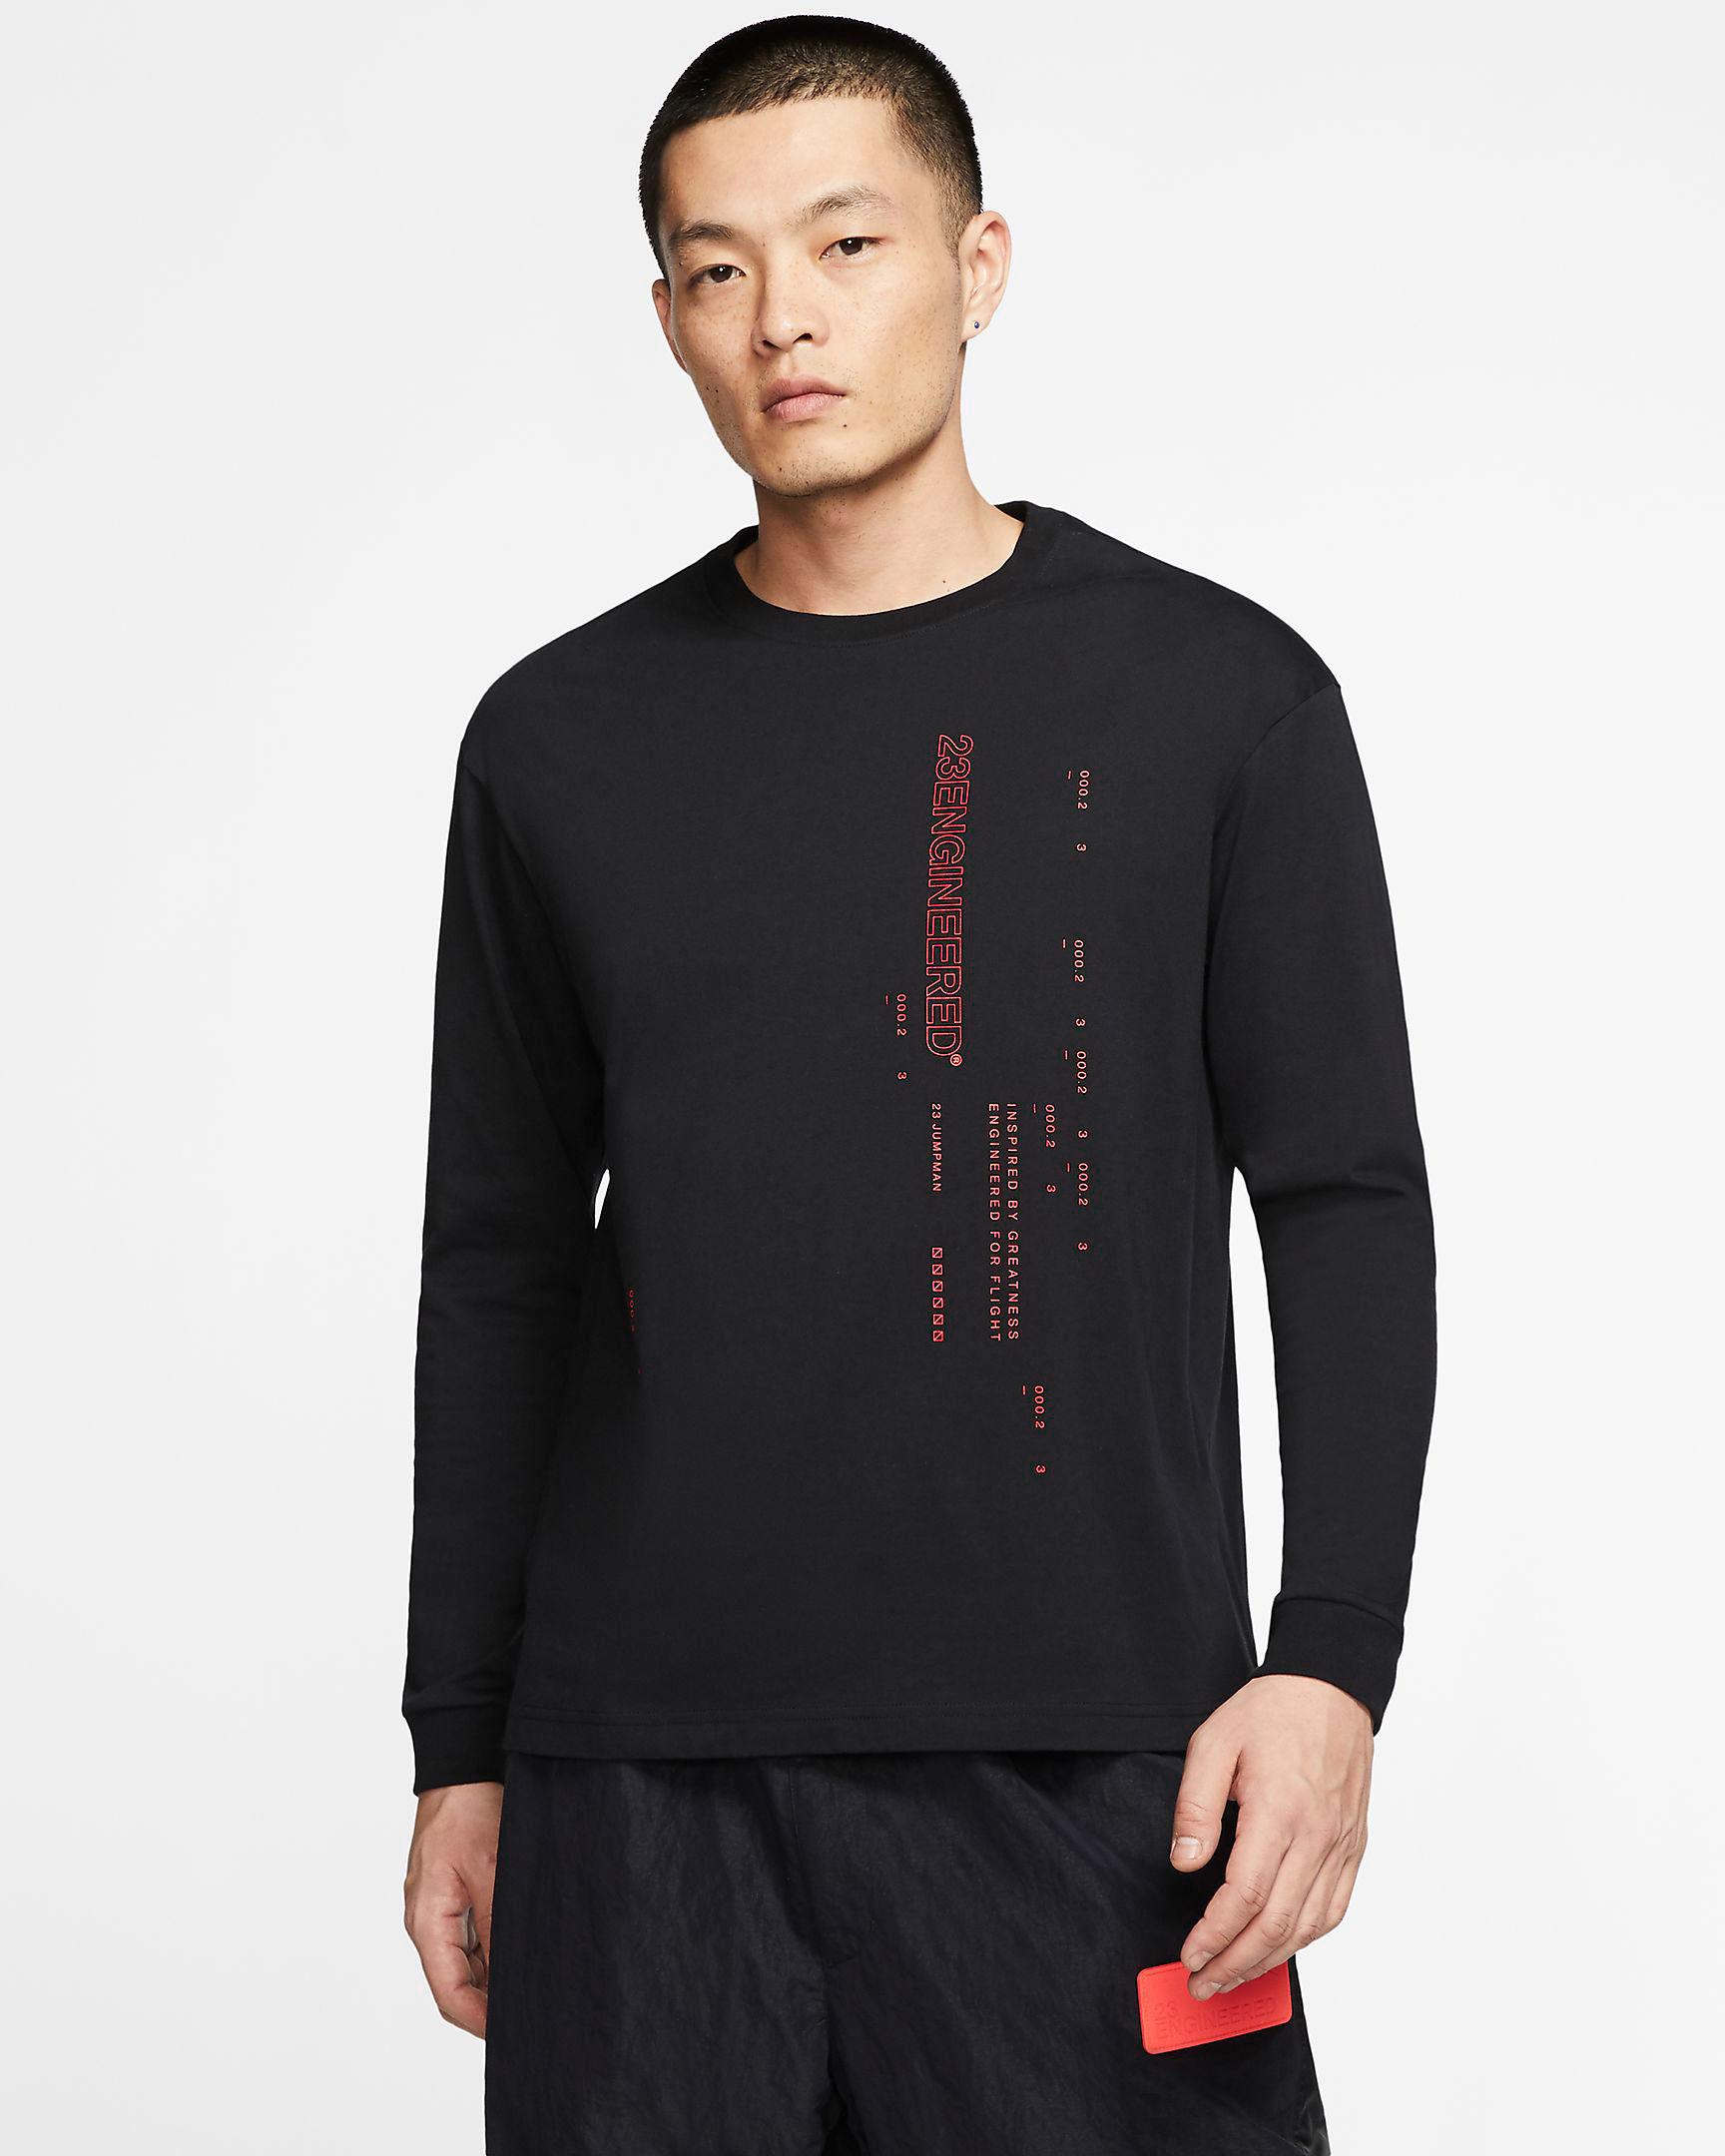 jordan-23-engineered-long-sleeve-shirt-black-red-1